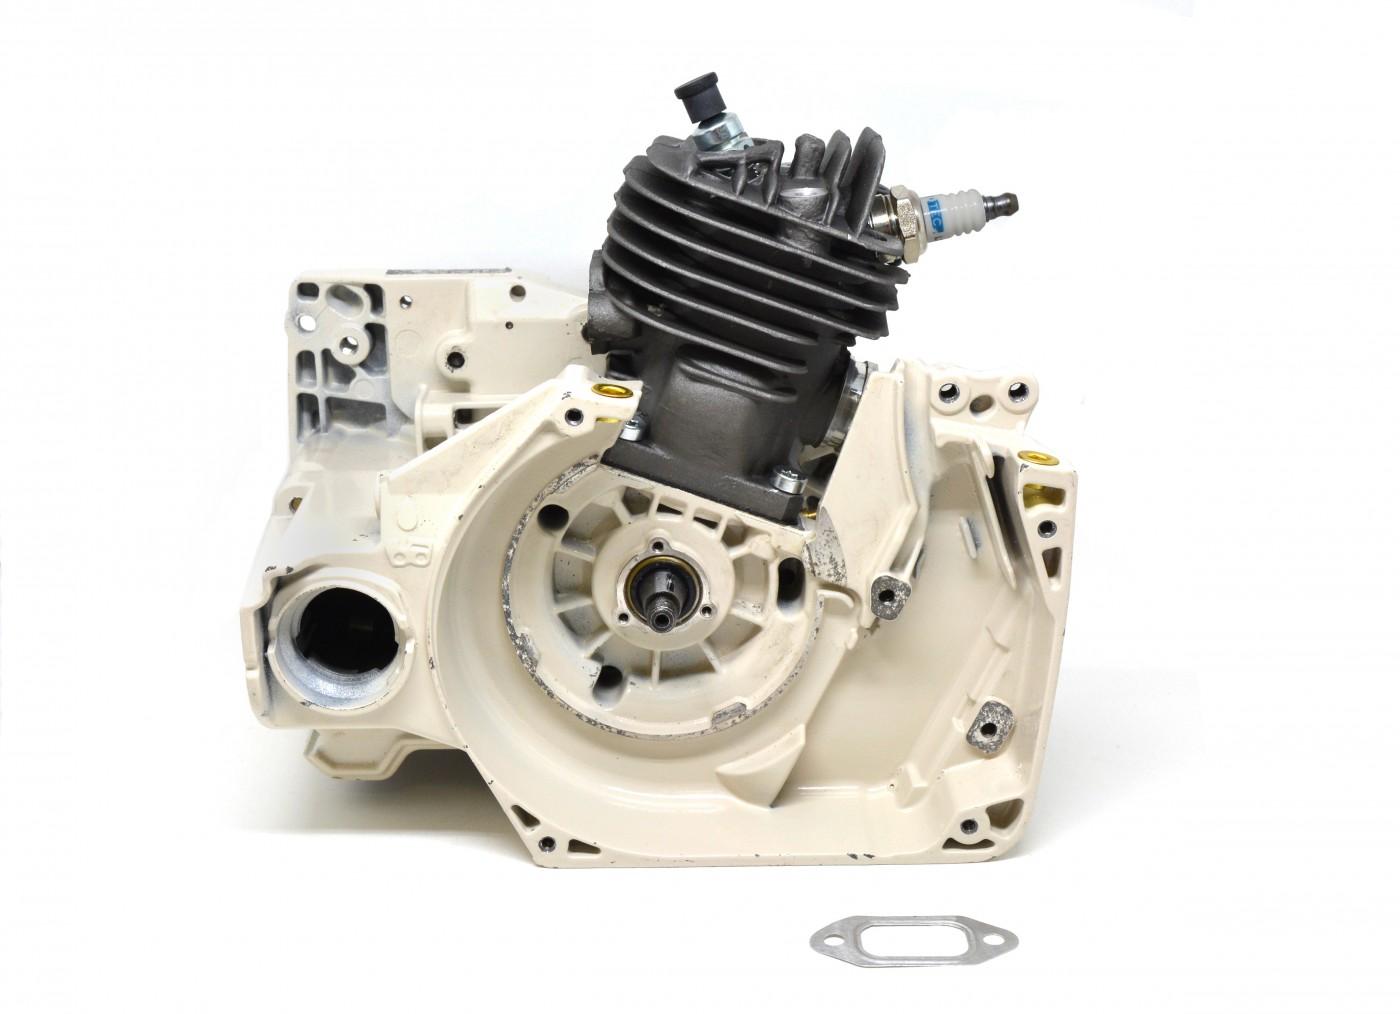 Polomotor Stihl 026 MS260